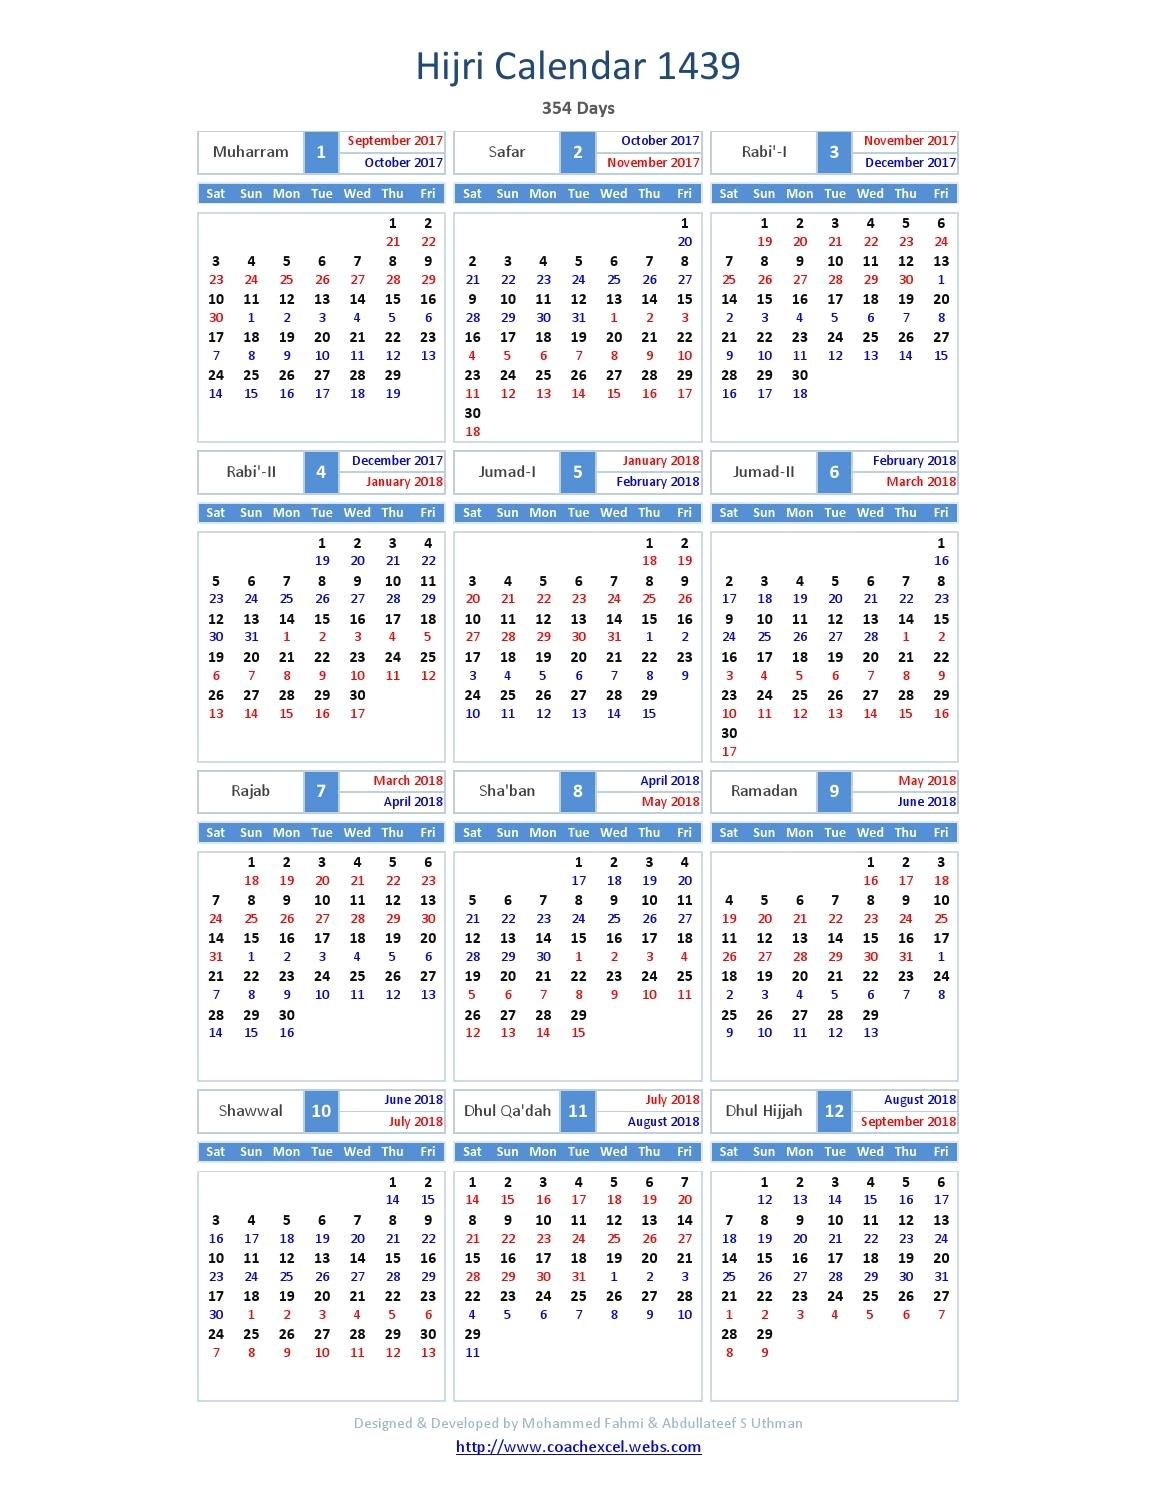 2016 Islamic Hijri Calendar Template Design Version 2. Hijri with regard to Hijri Calendar 1438 With Gregorian Calendar